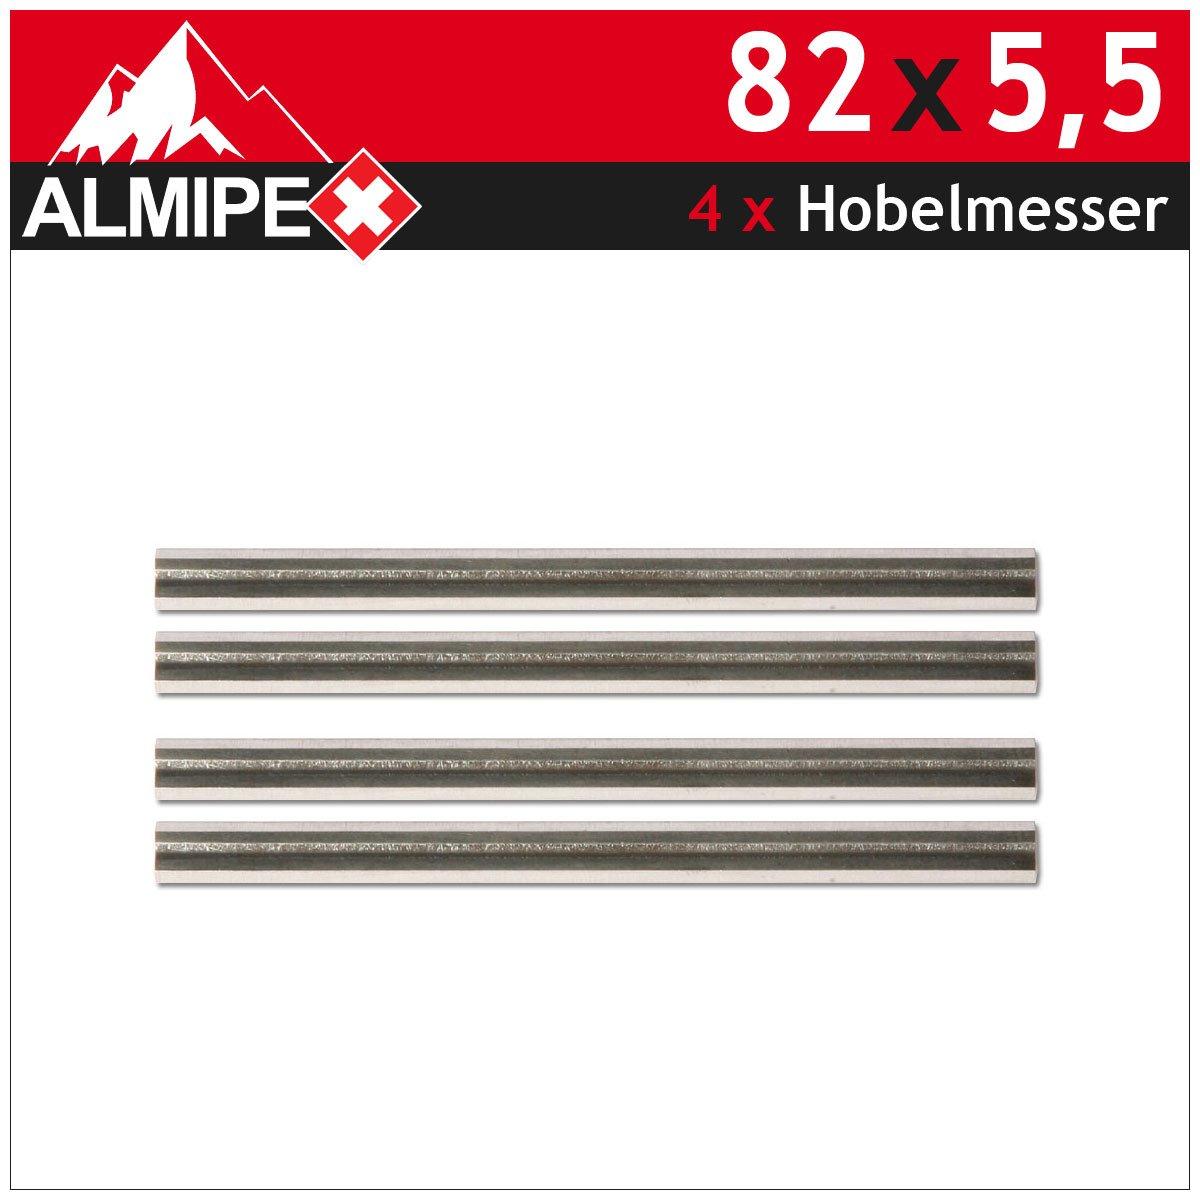 4x Hobelmesser HSS Ersatzmesser HM Wendemesser fü r Elektrohobel 82 x 5, 5 ALMIPEX